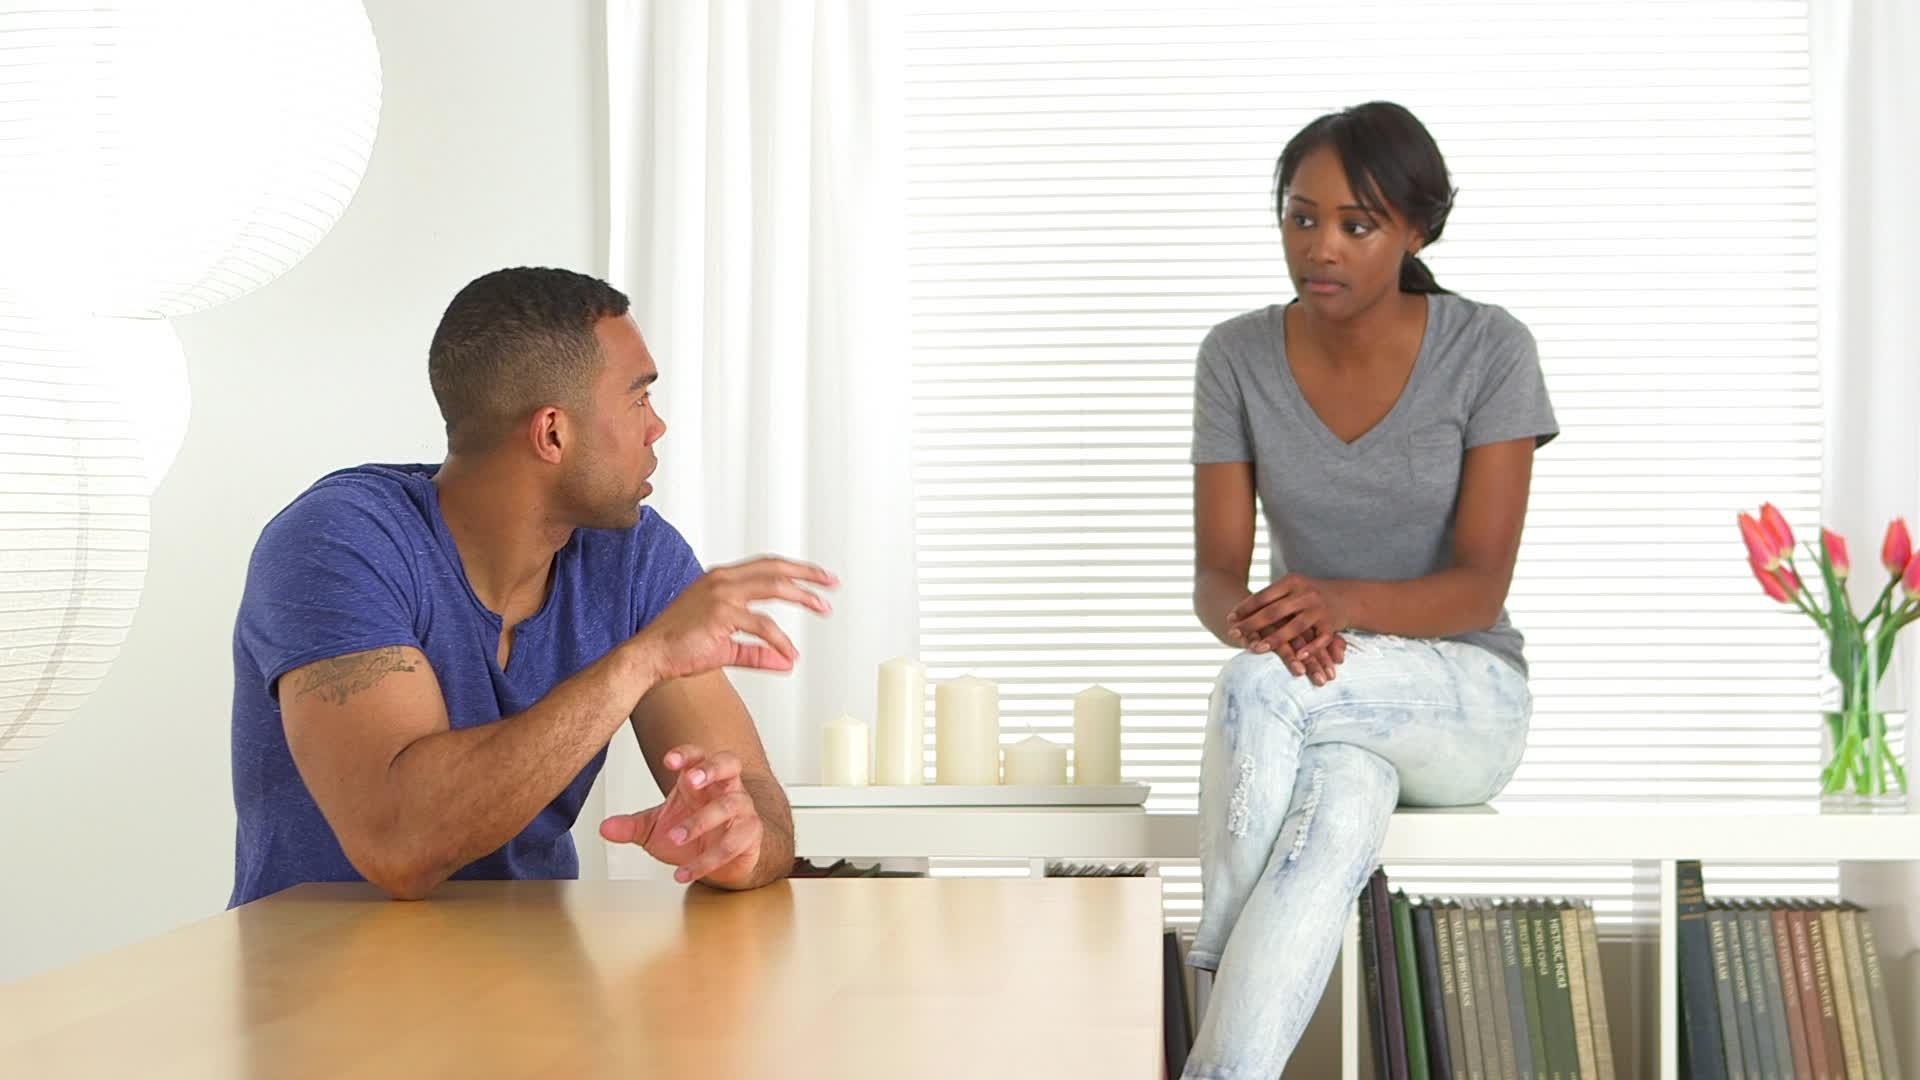 black-couple-casually-talking-each-footage-023901615_prevstill